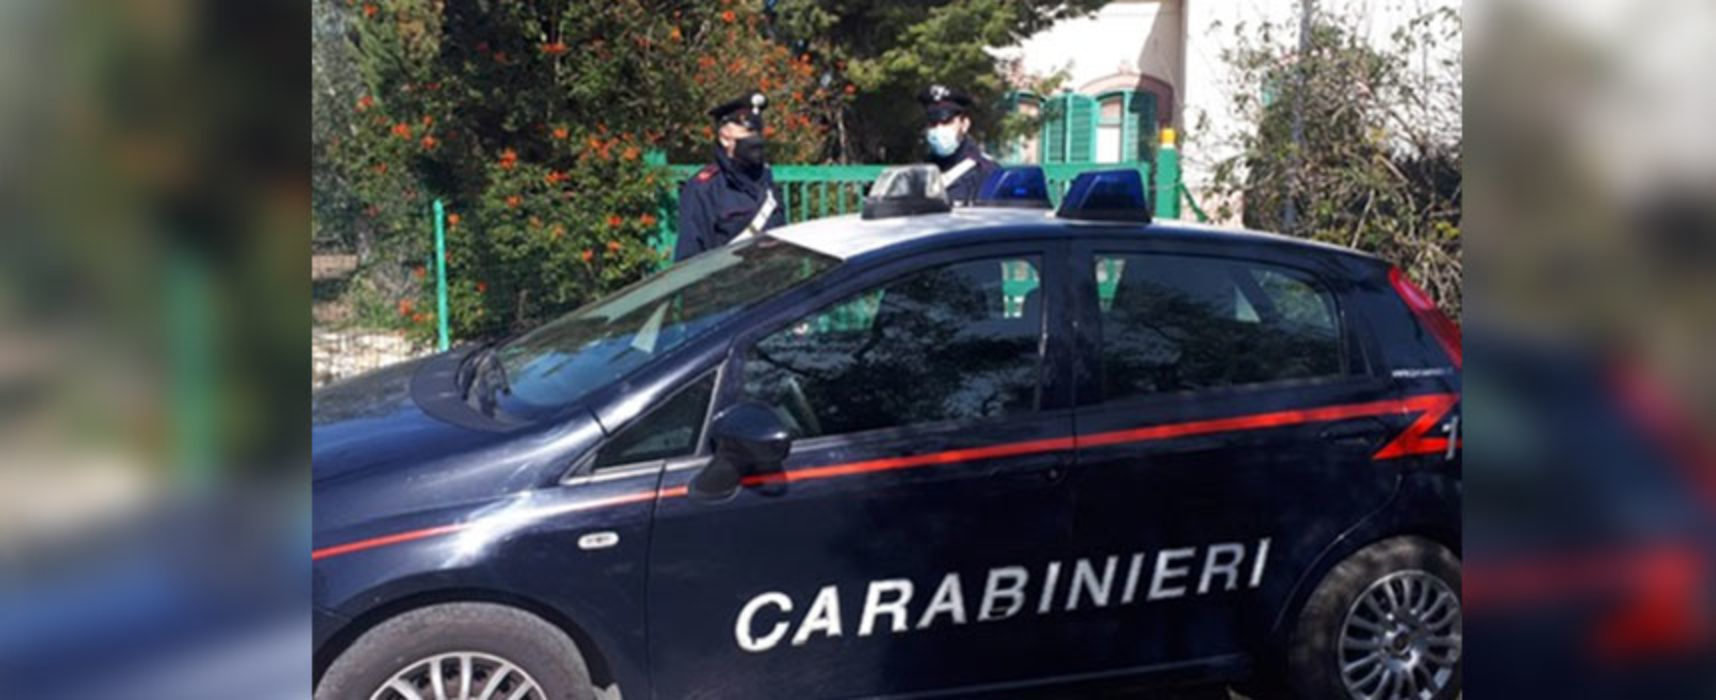 Furto in una villa storica a Bisceglie, arrestate tre persone